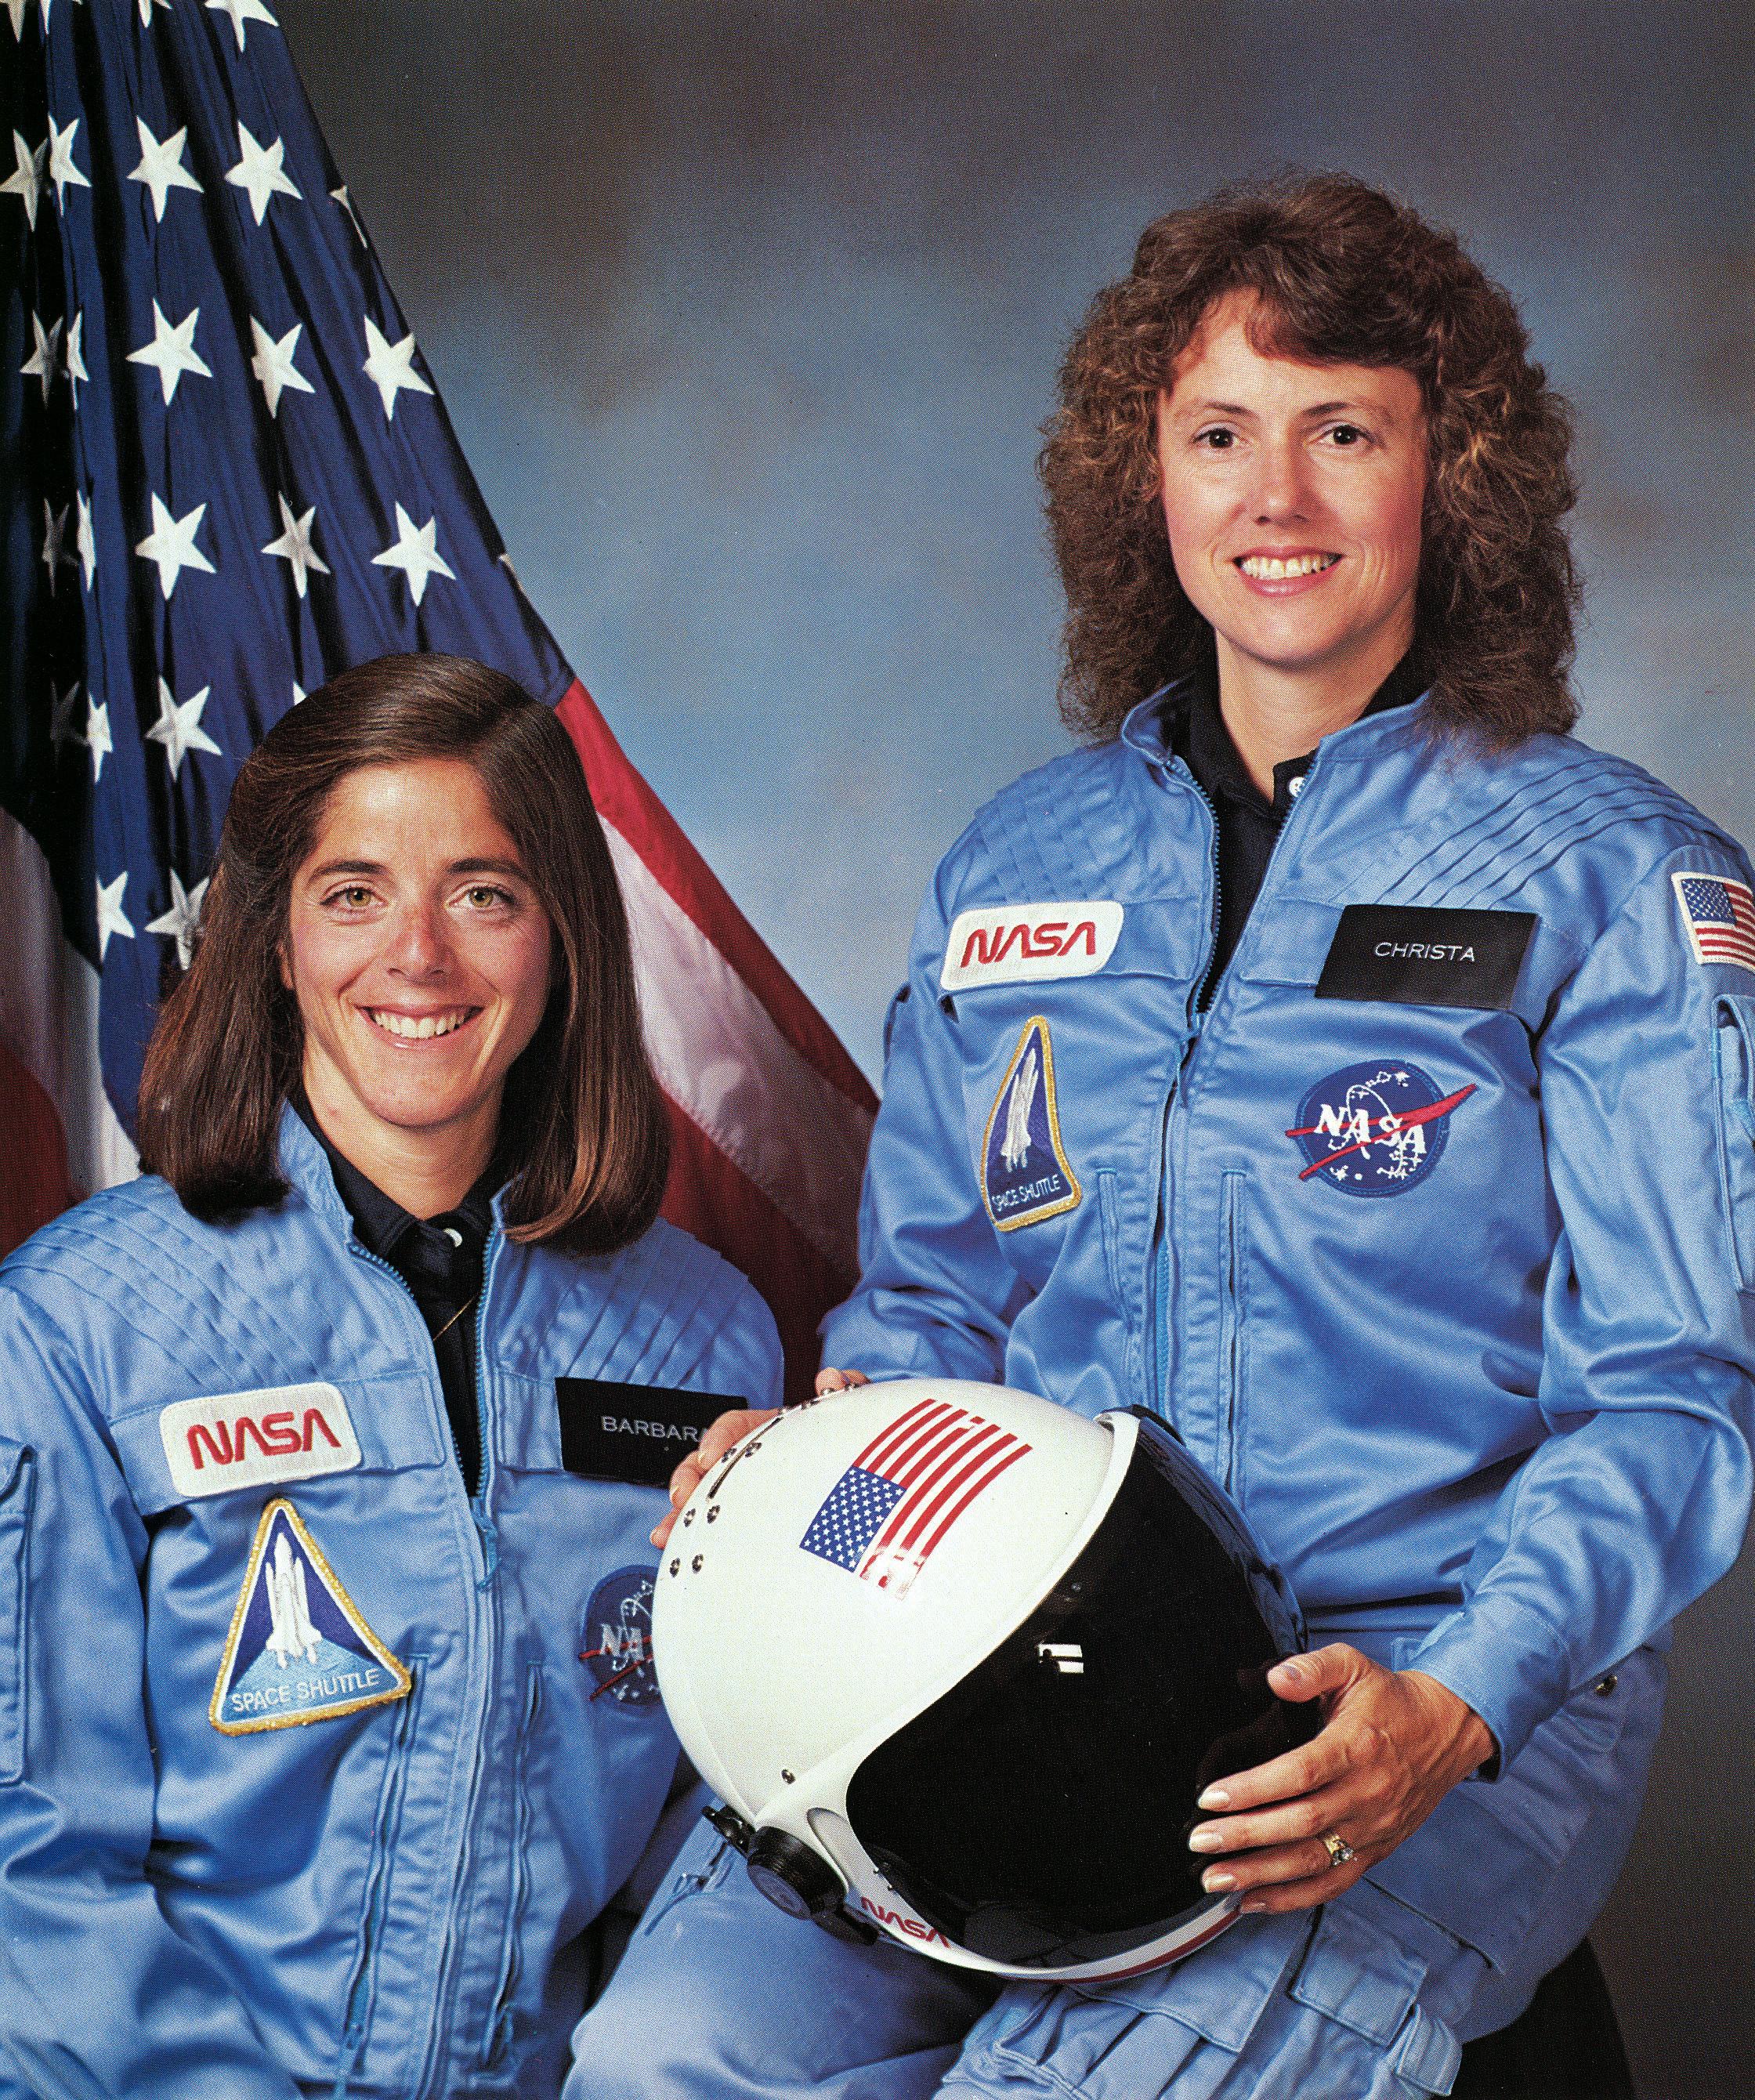 space shuttle challenger barbara morgan - photo #3